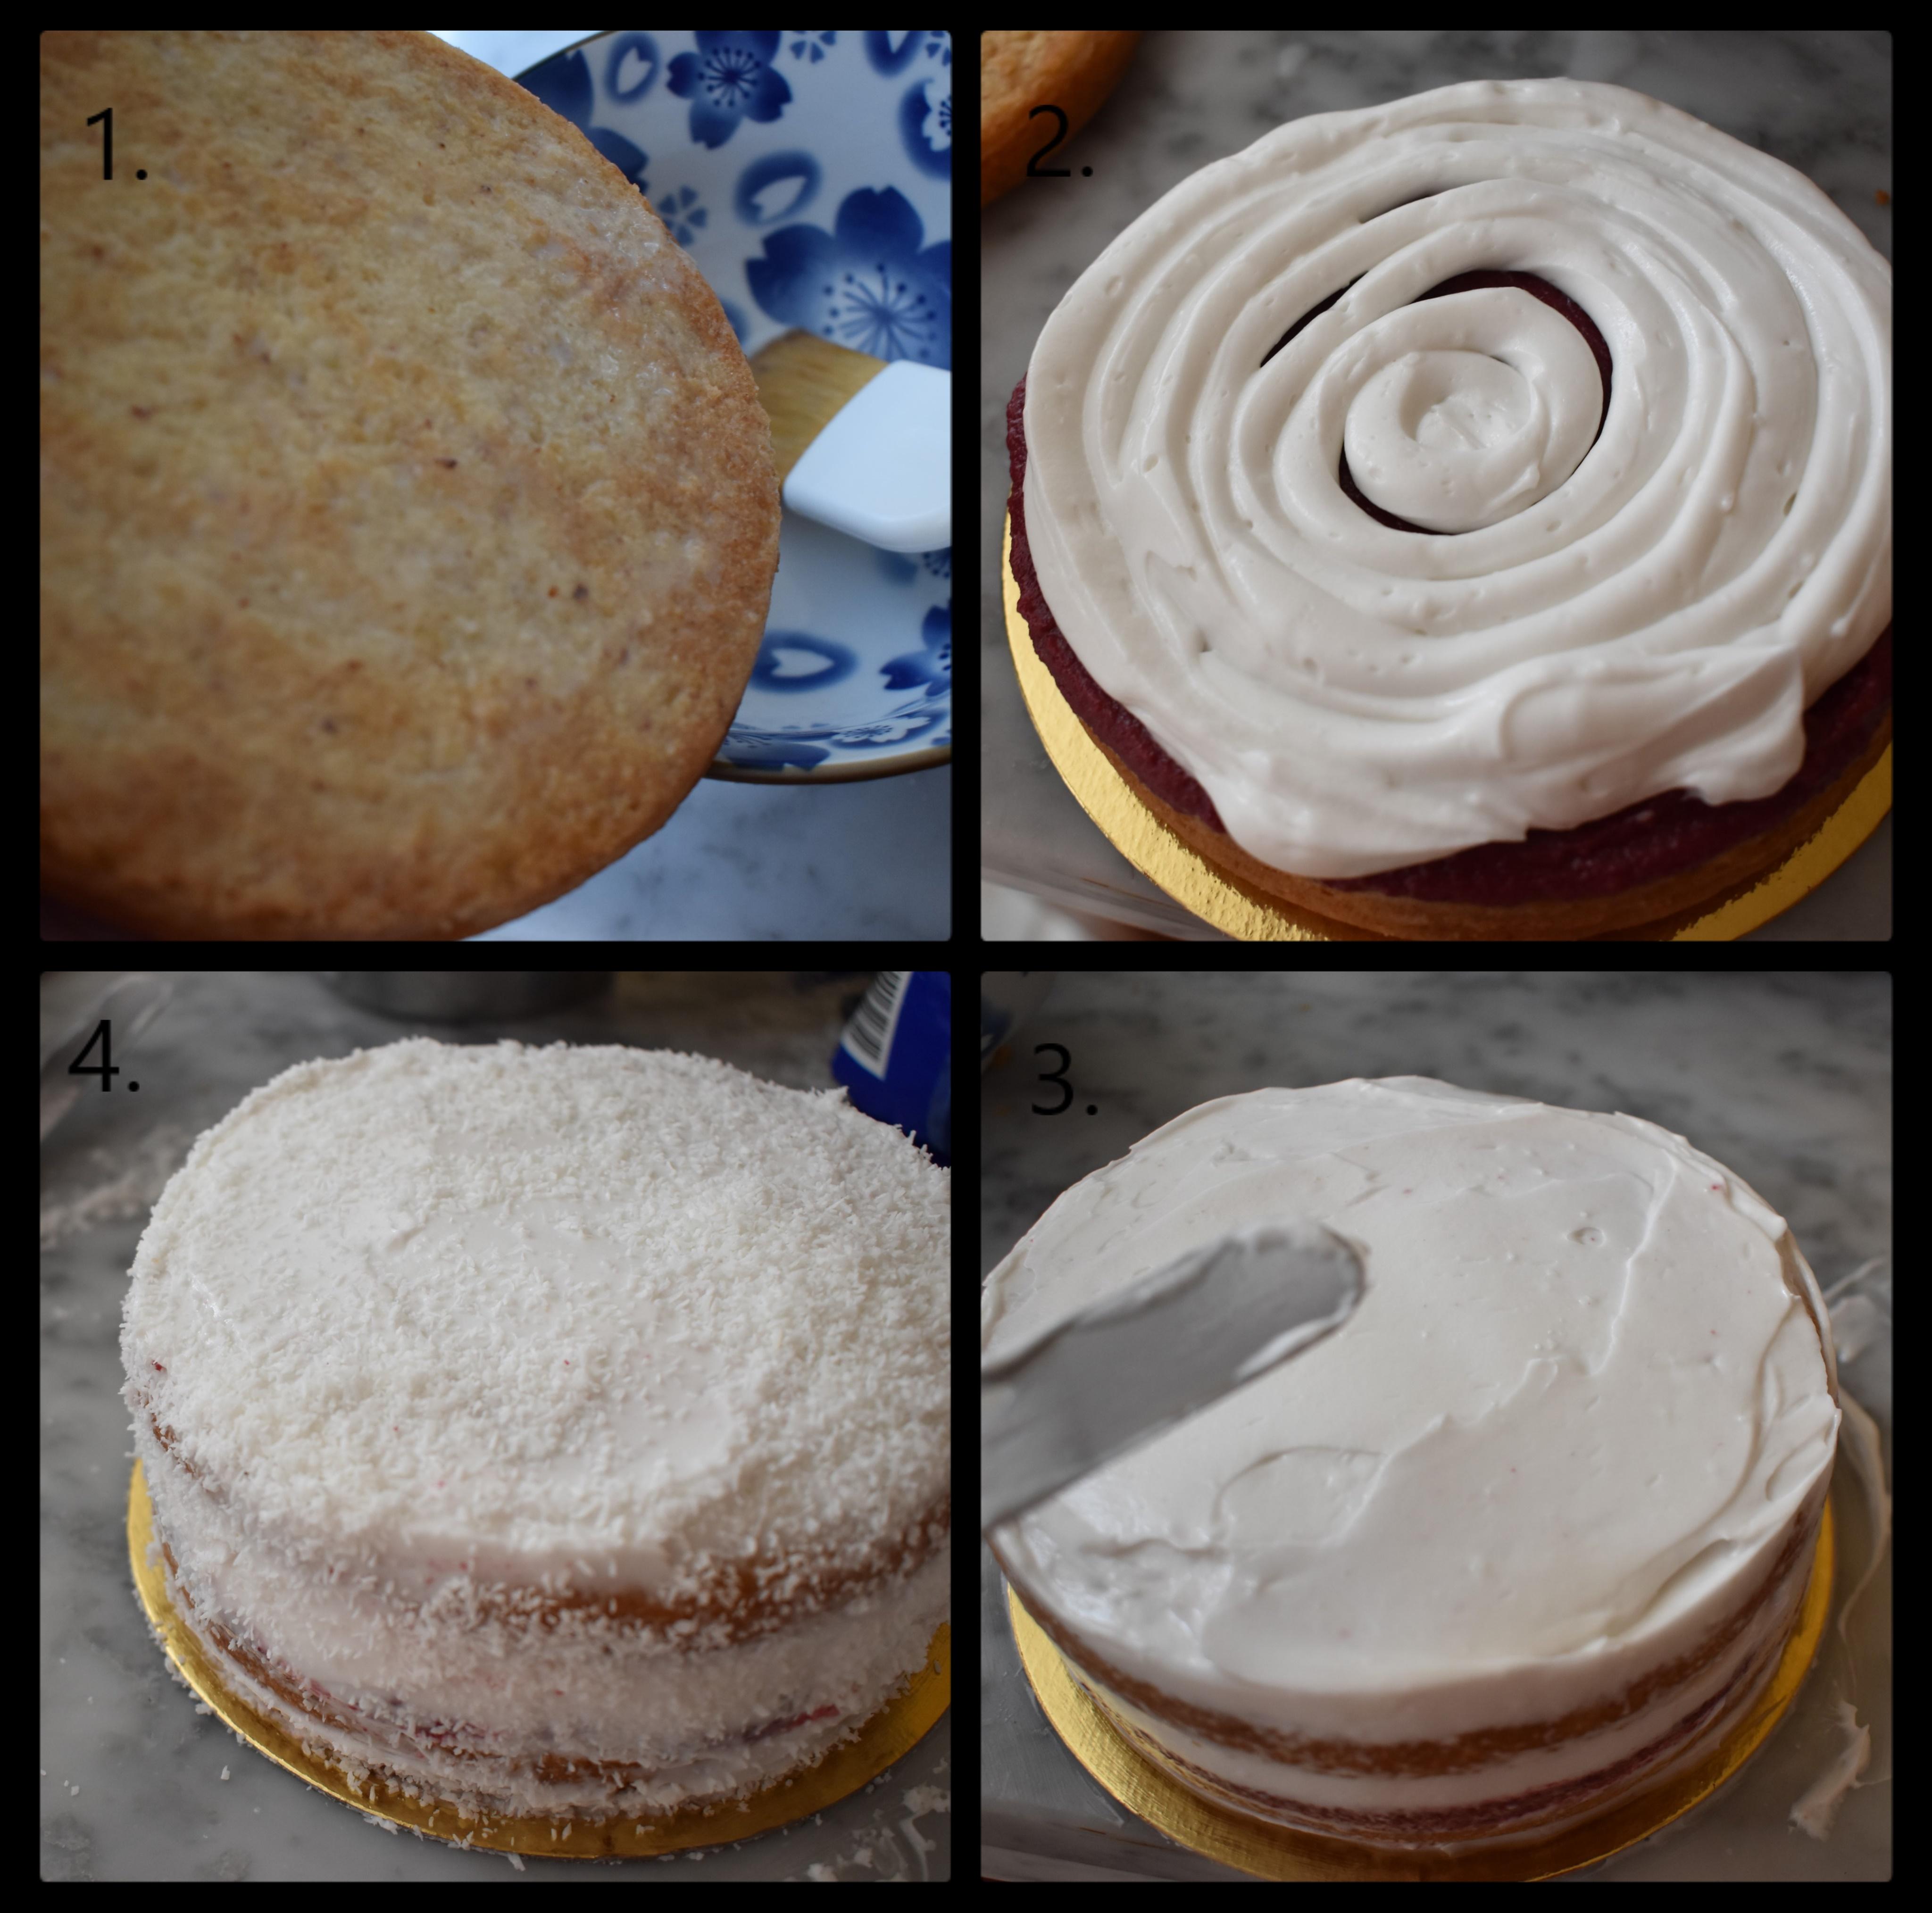 Snowy love vegan layer cake. assembling